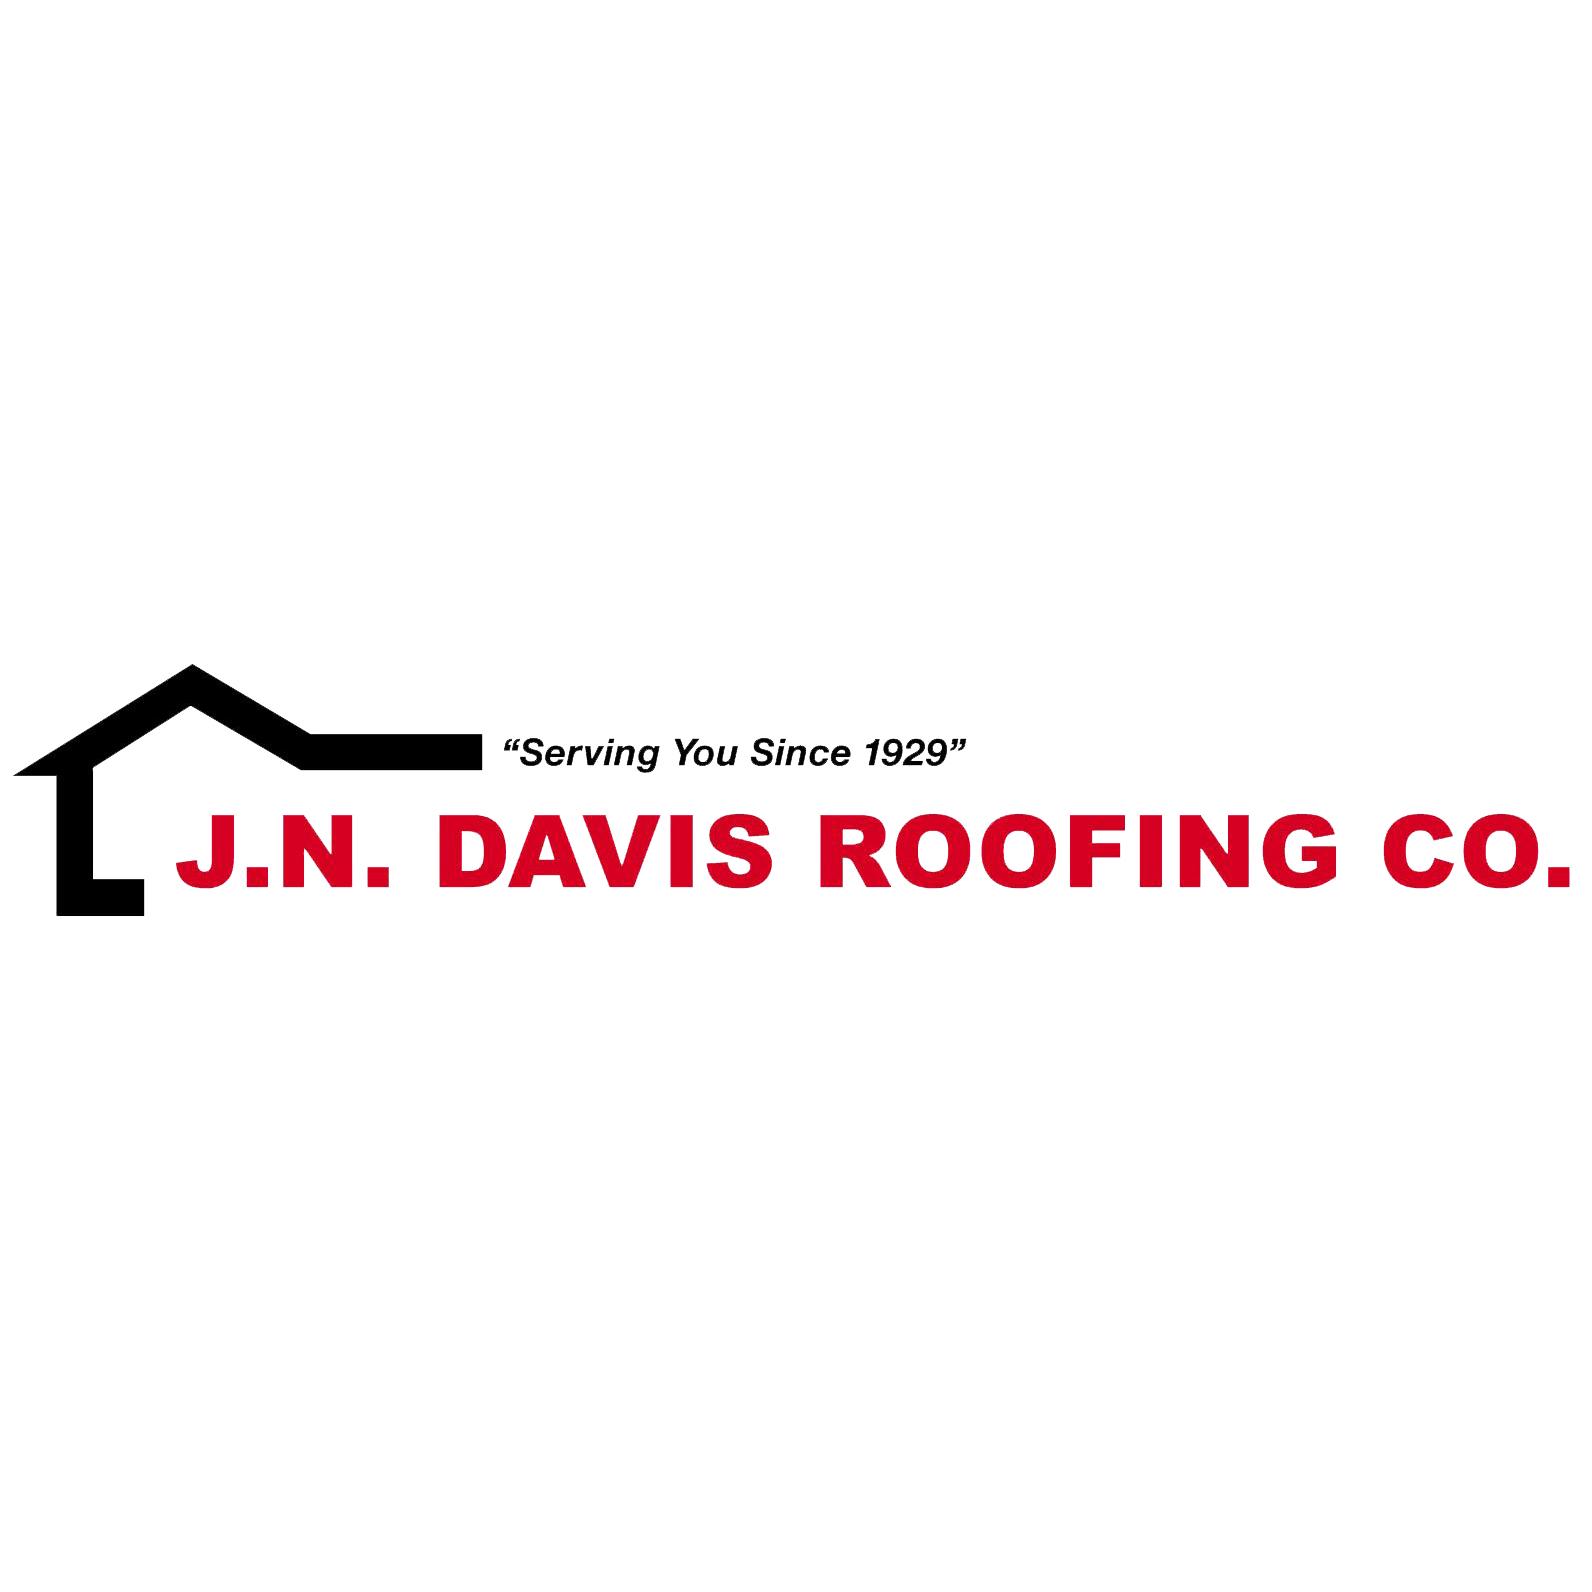 J.N. Davis Roofing